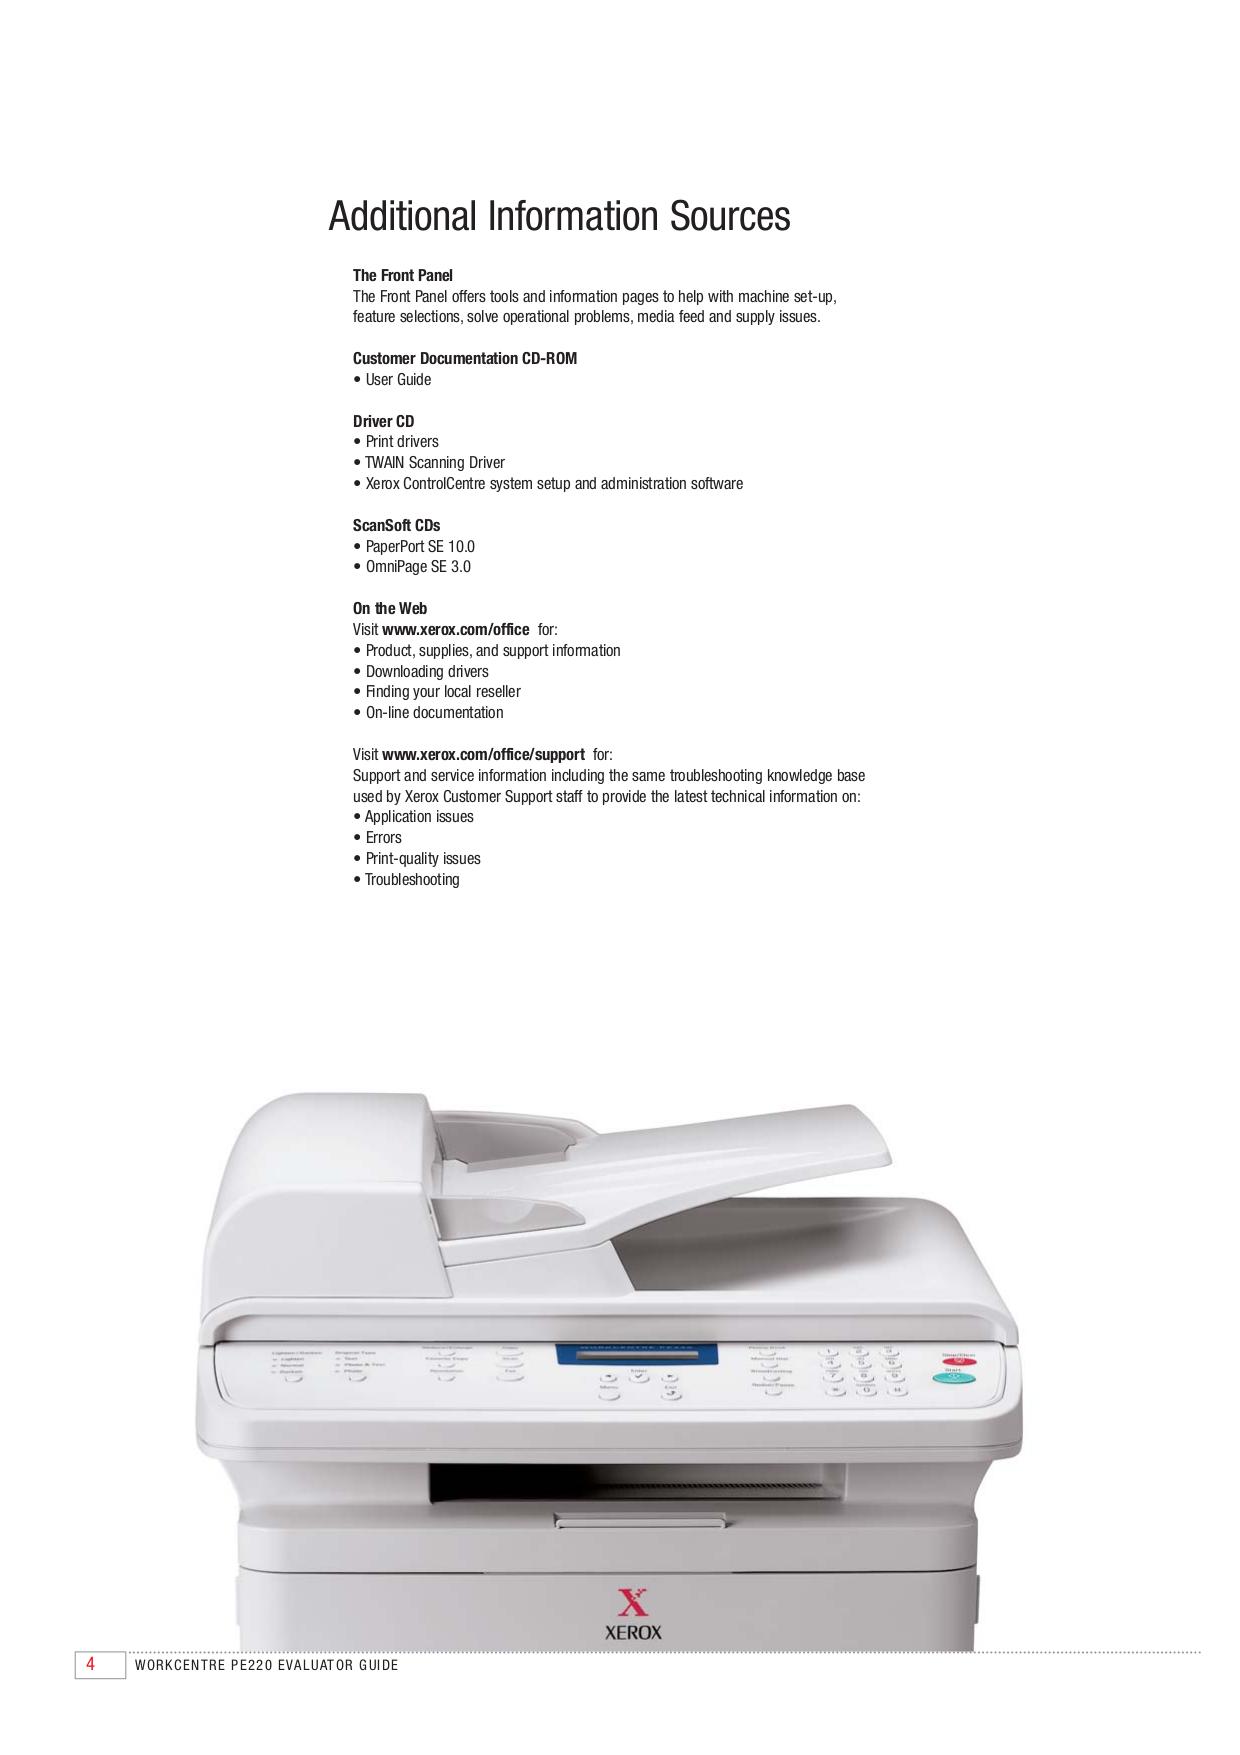 PDF manual for Xerox Multifunction Printer WorkCentre PE220